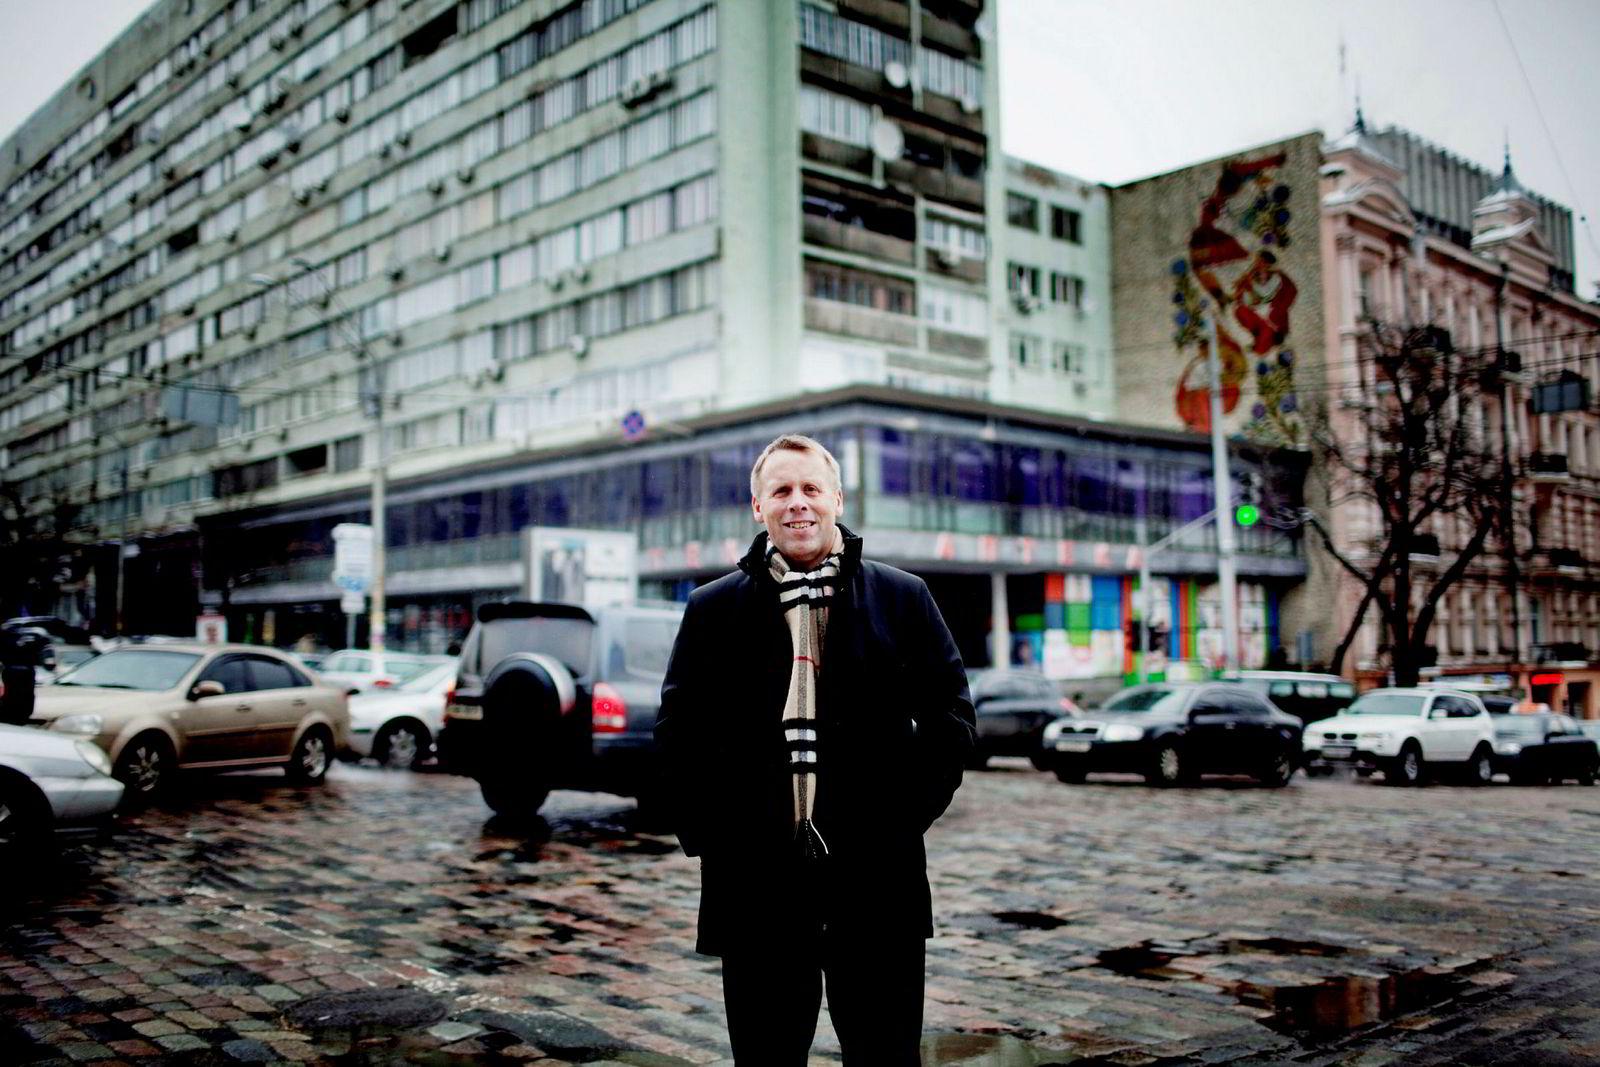 Trond Moe her fotografert i Ukrainas hovedstad Kiev ved en tidligere anledning.